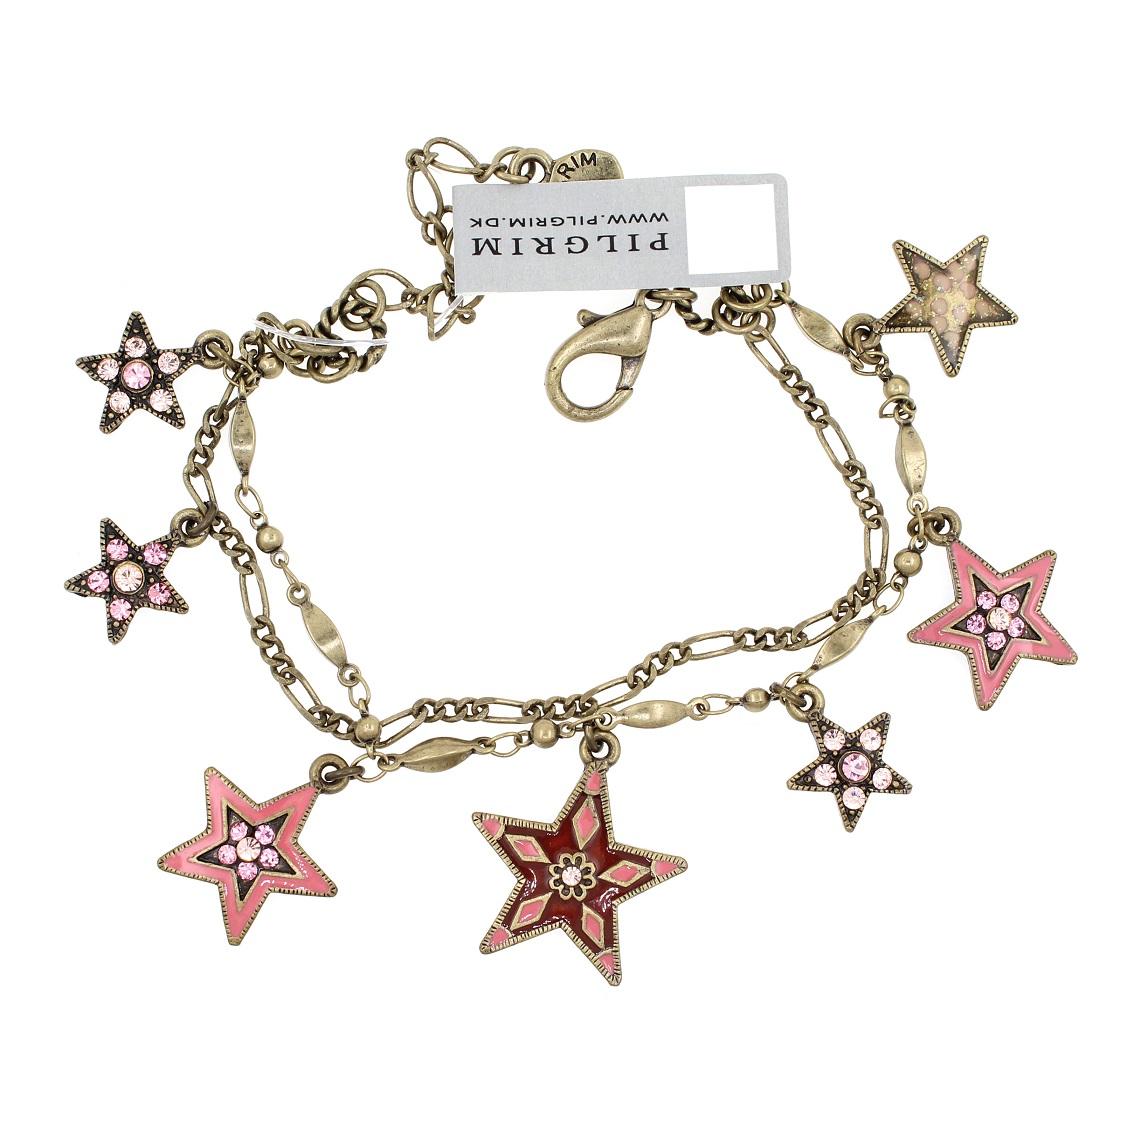 PILGRIM - STARS - Double Strand Charm Bracelet - Gold Plate/Pink Swarovski BNWT